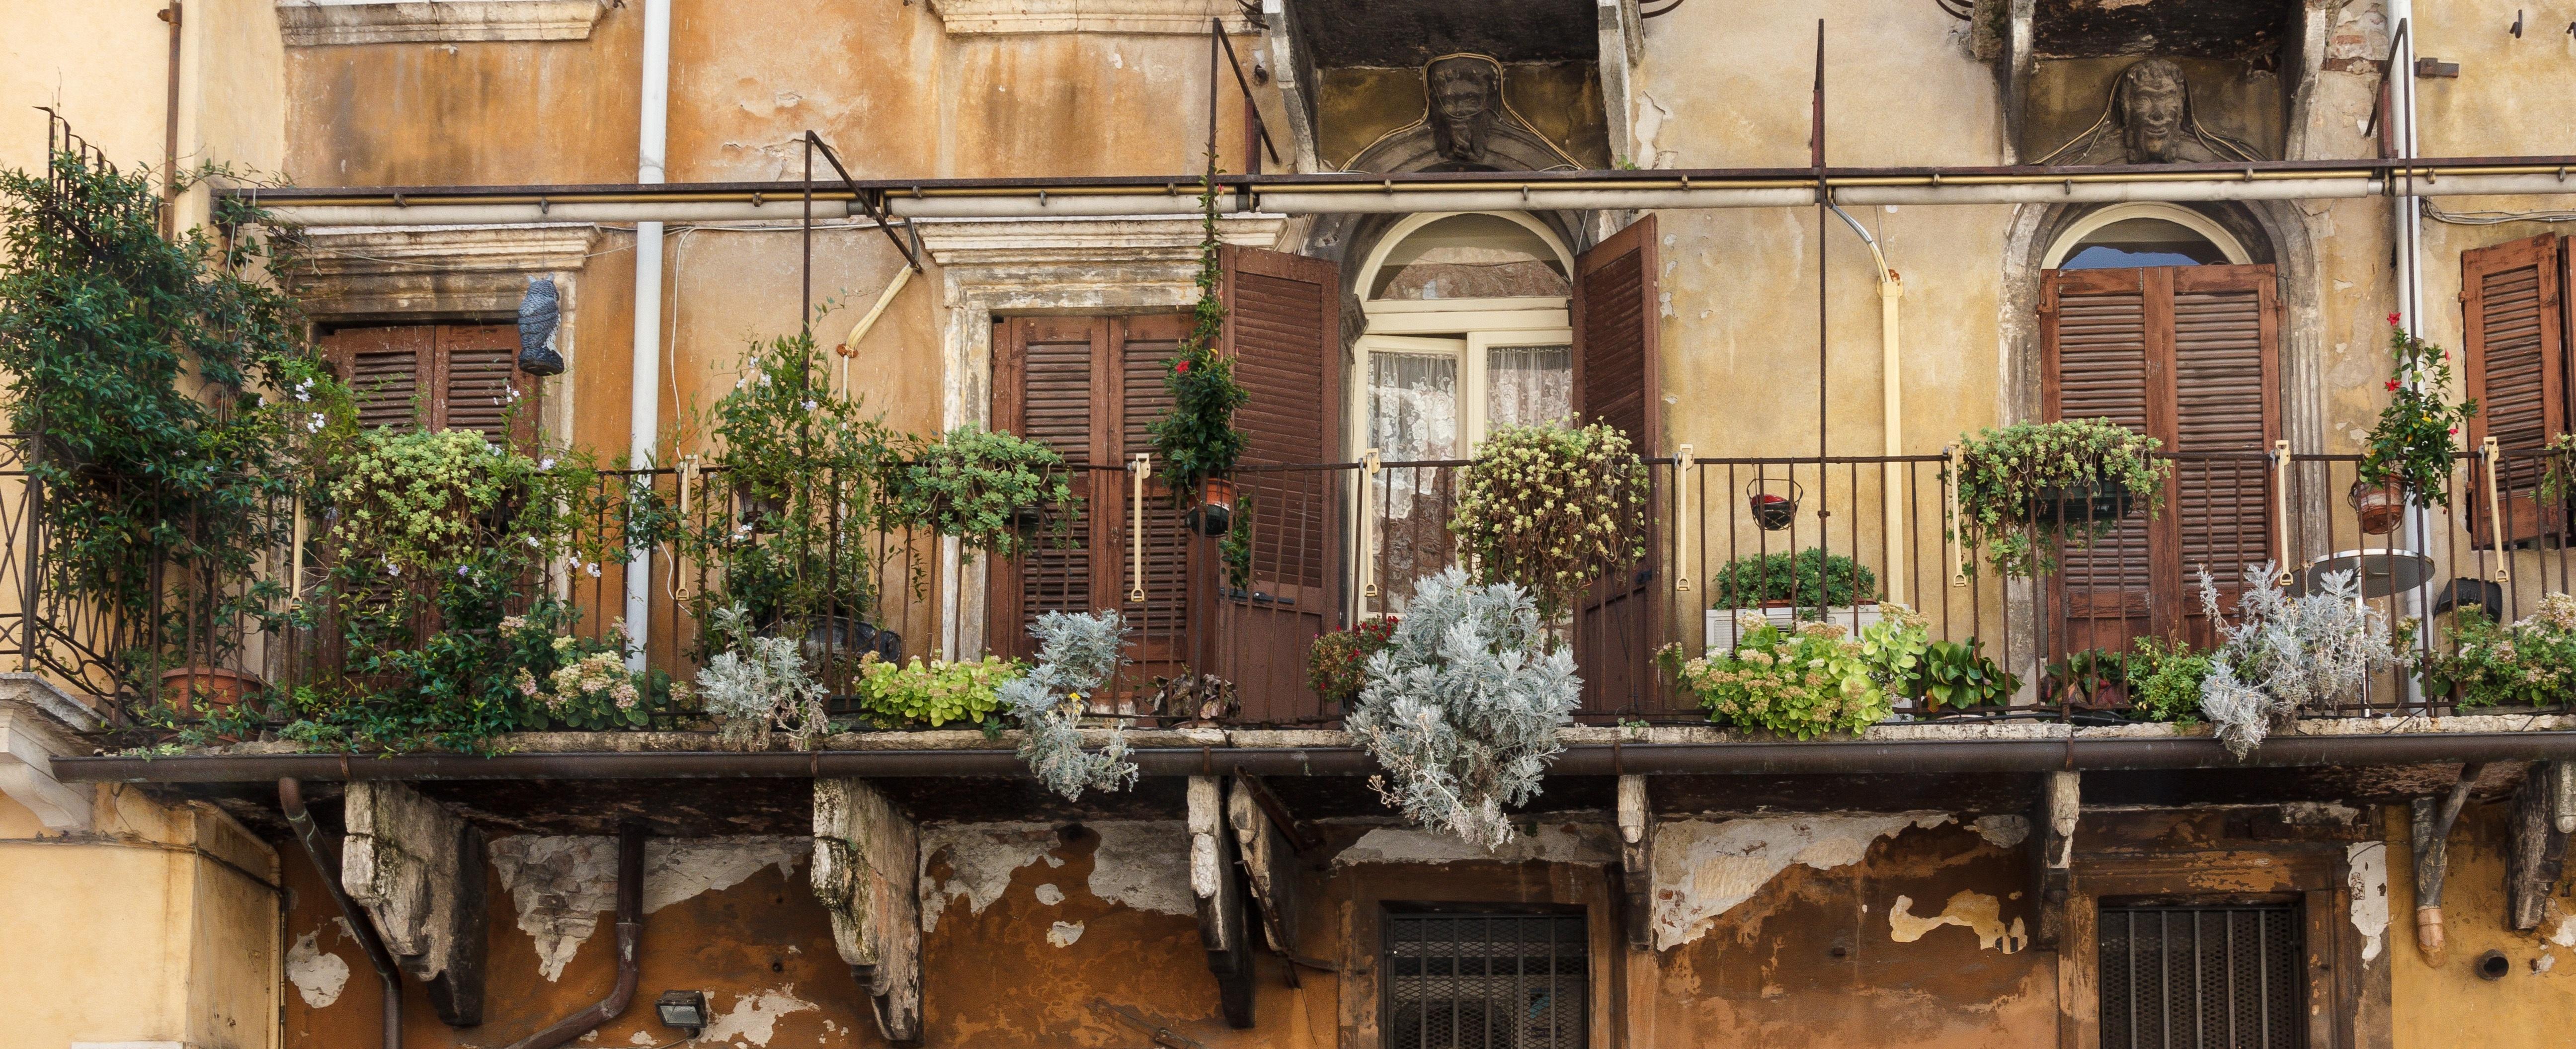 Картинки : особняк, здание, старый, главная, балкон, фасад, .